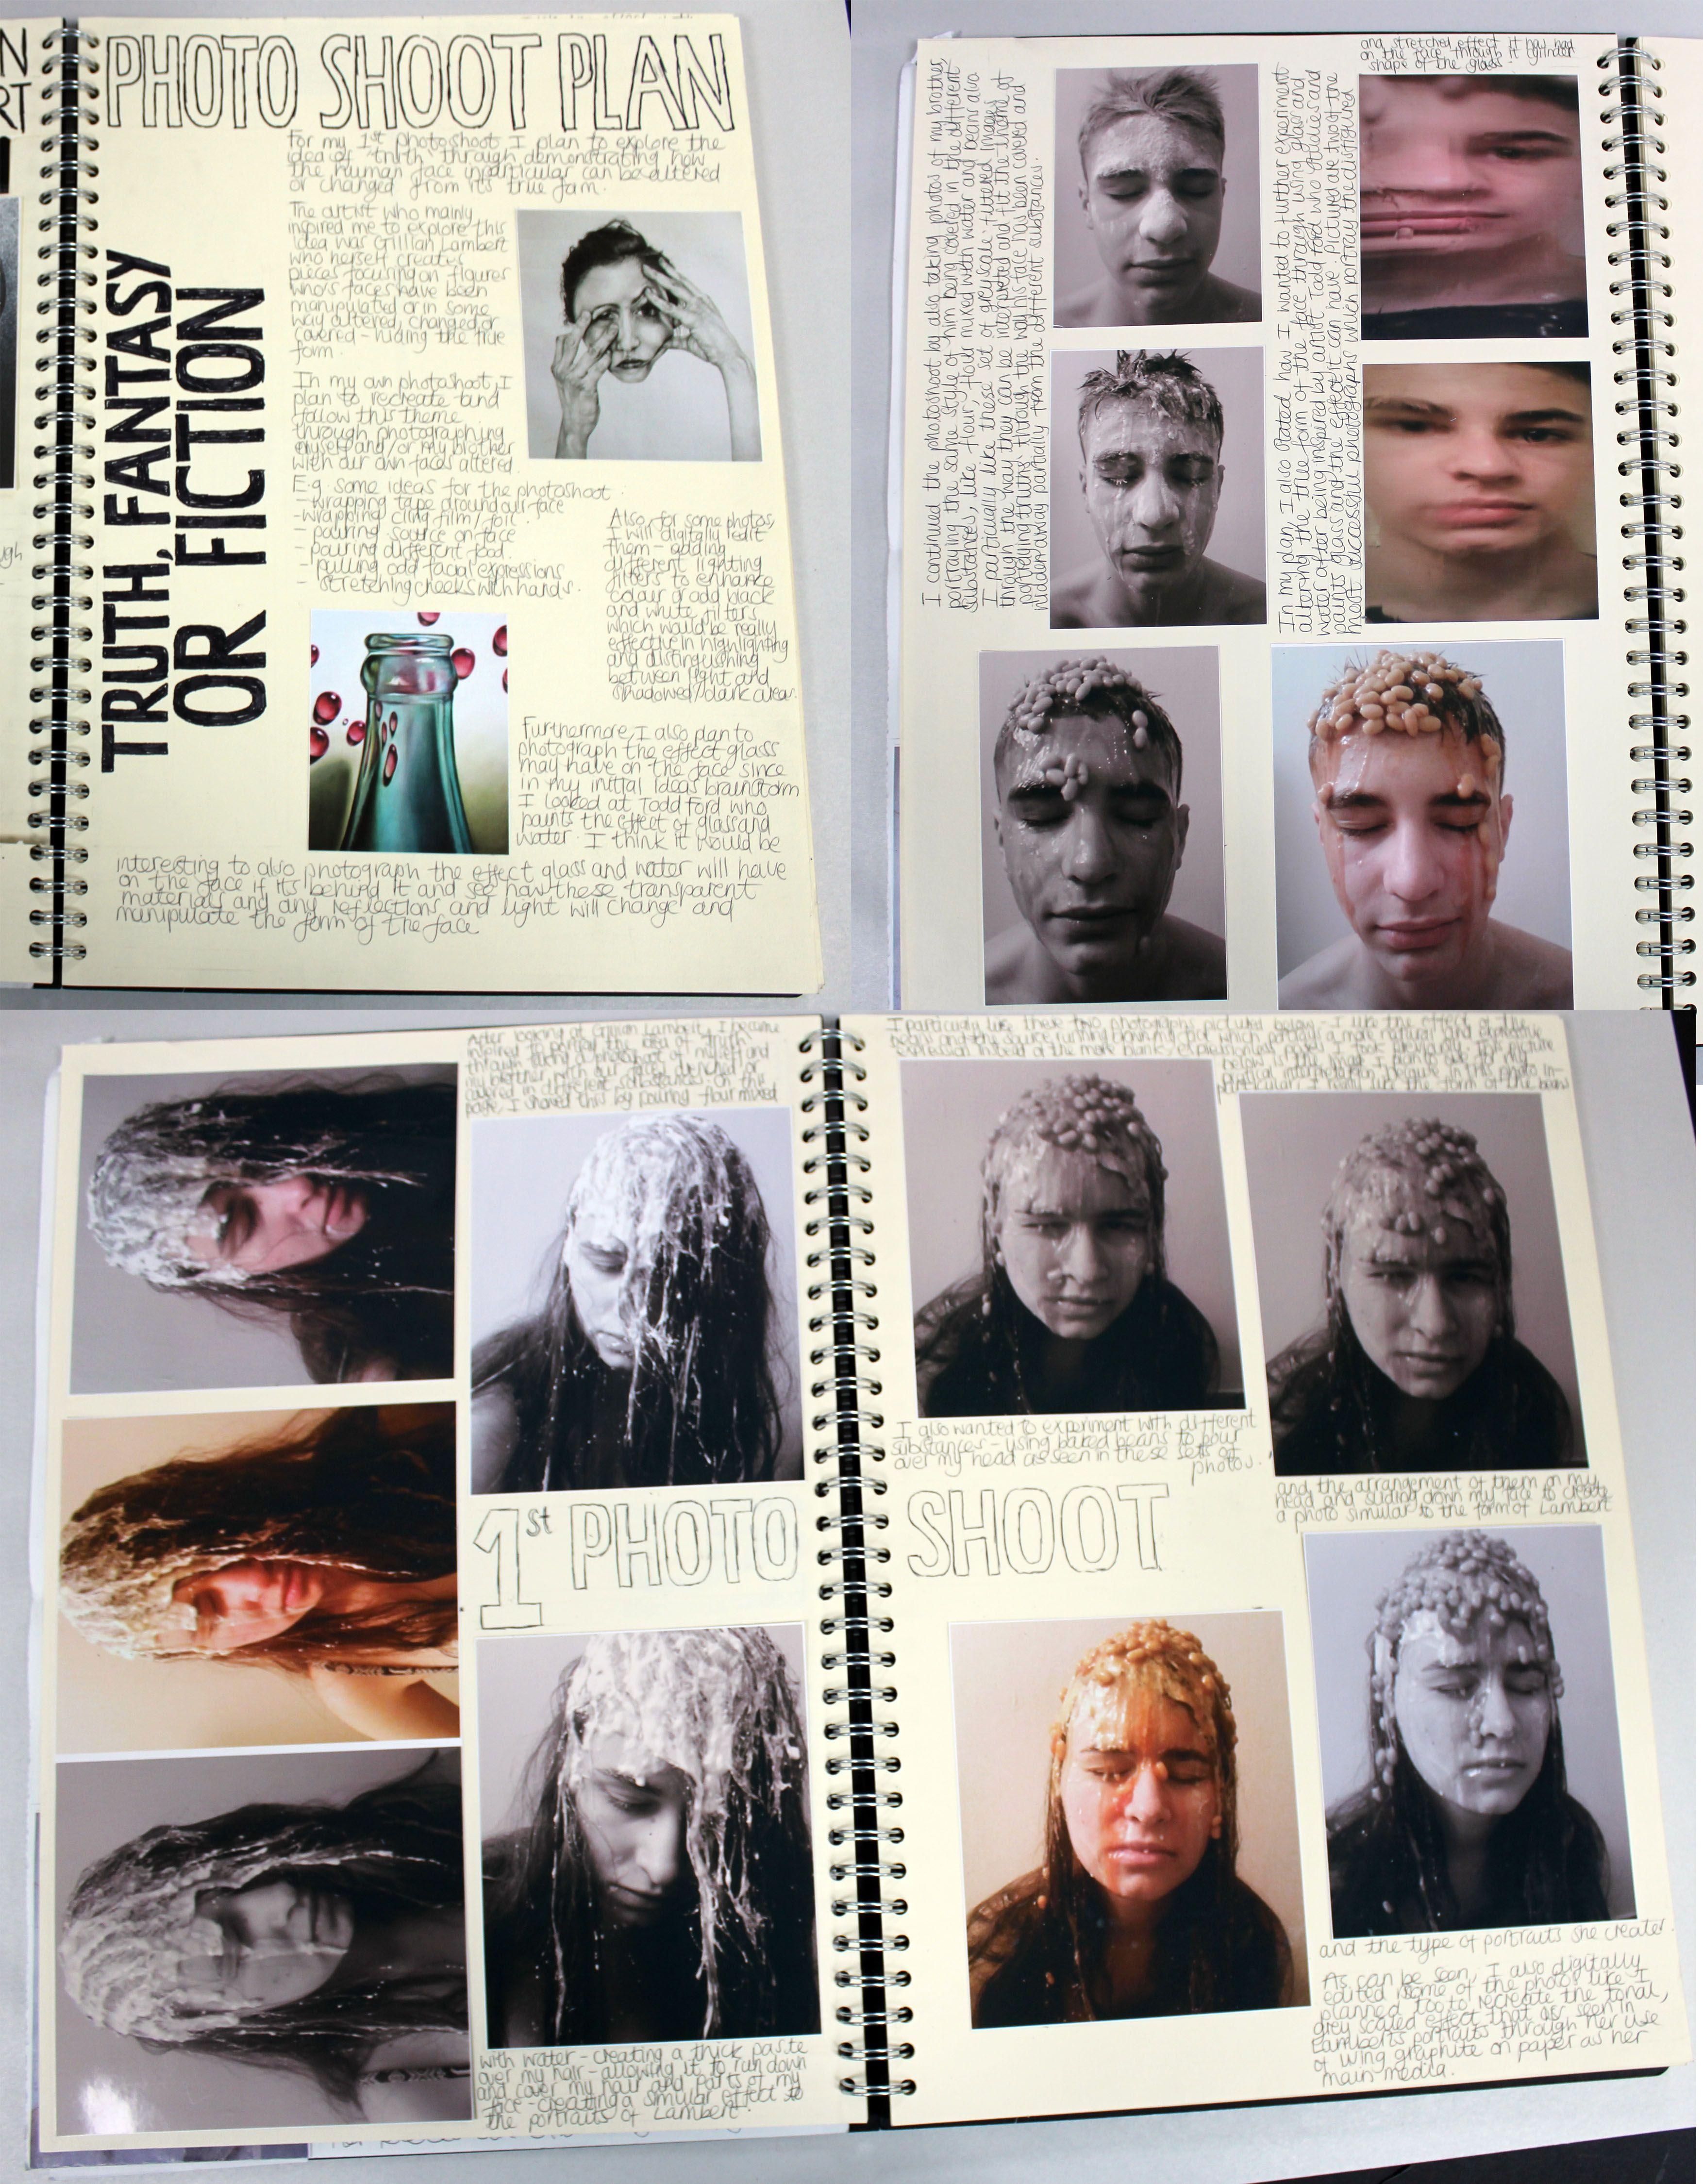 Al A2 Fine Art A3 Cream Sketchbook Photoshoot Plan And